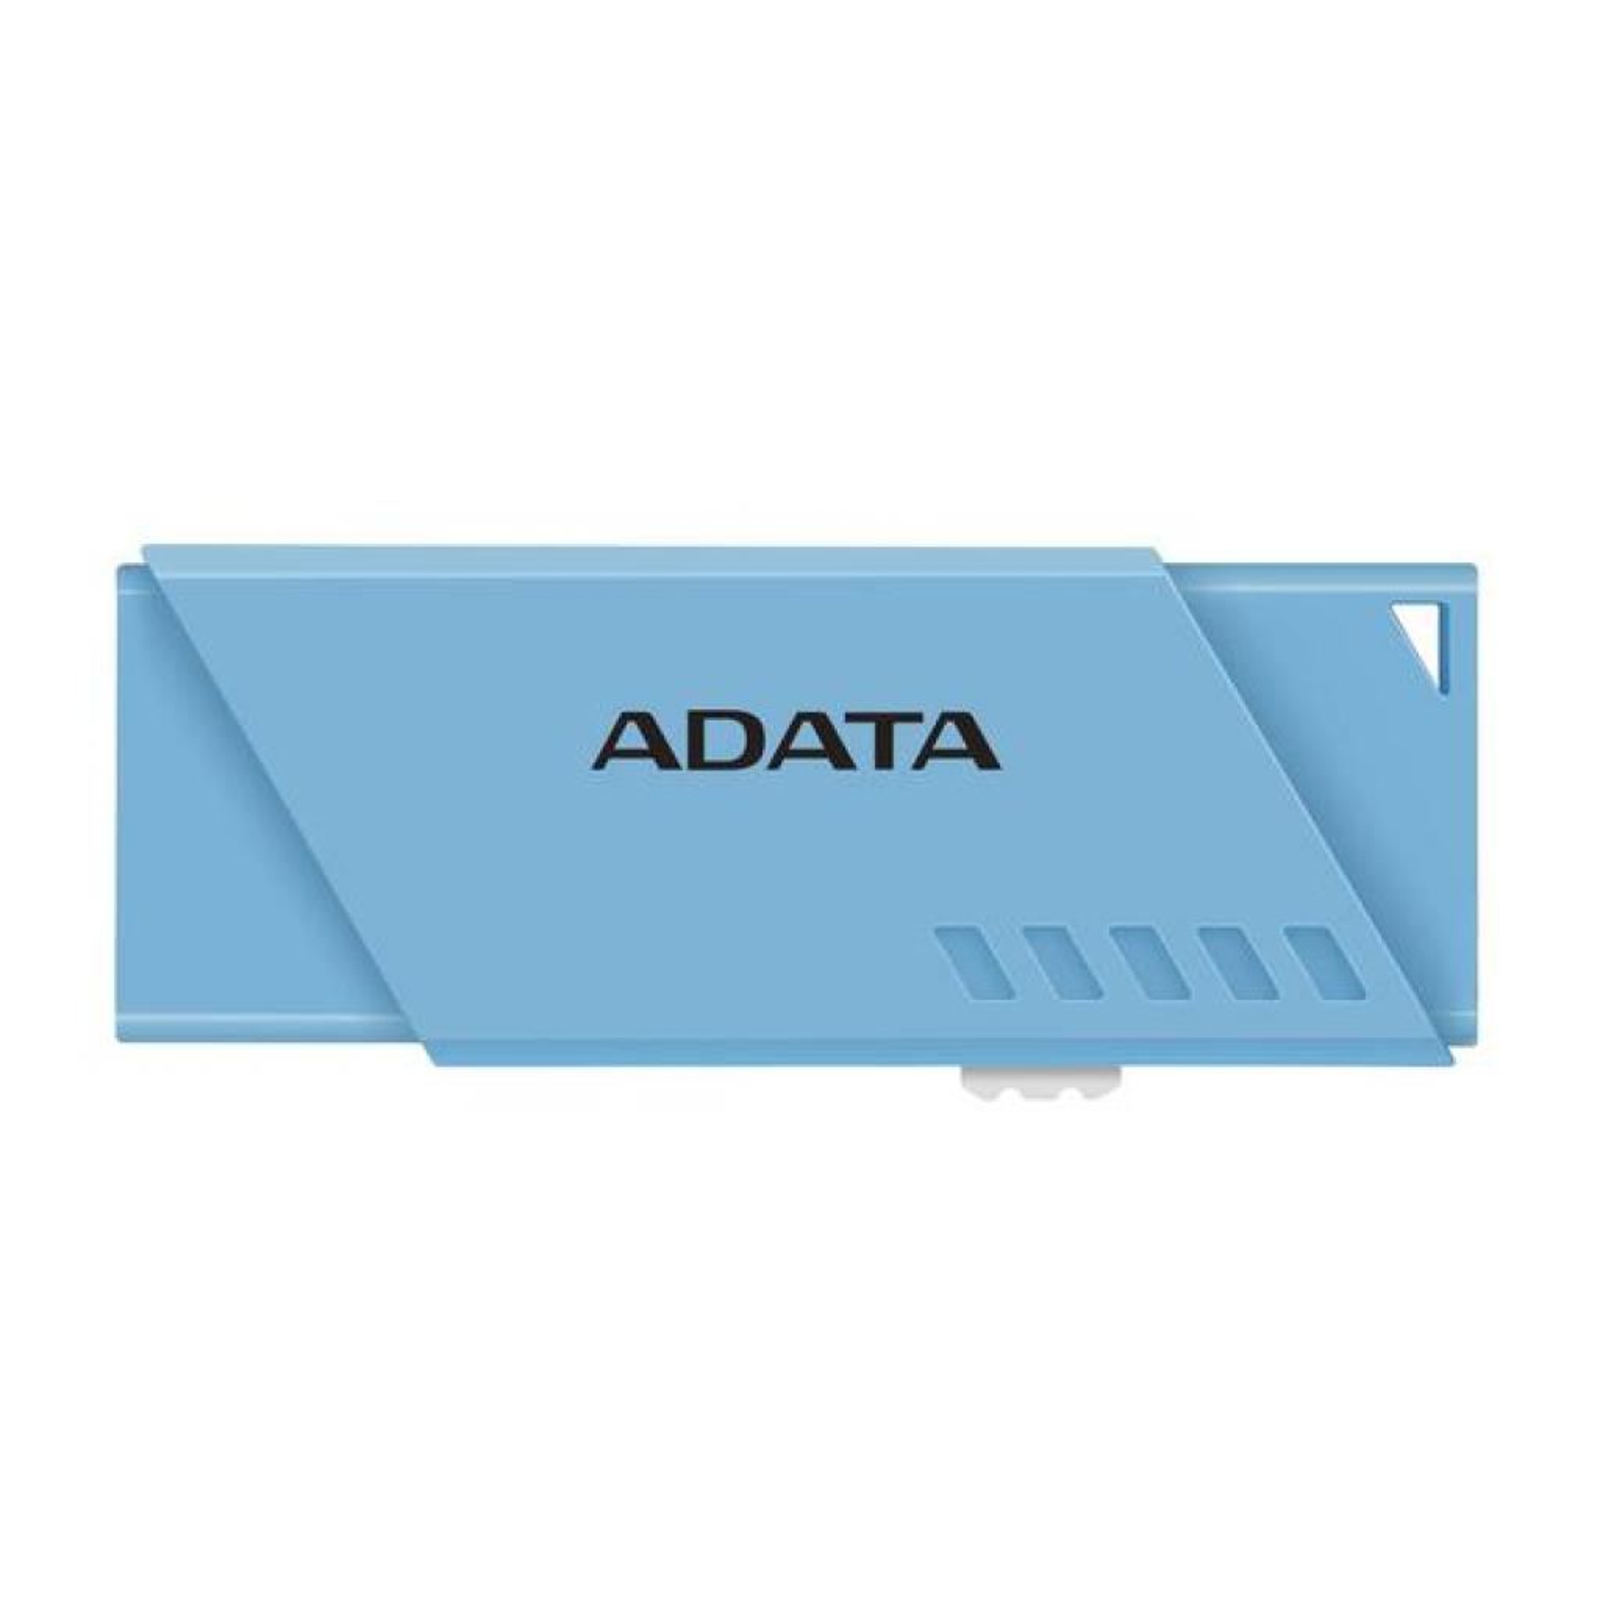 USB флеш накопитель ADATA 16GB UV230 Blue USB 2.0 (AUV230-16G-RBL) изображение 2